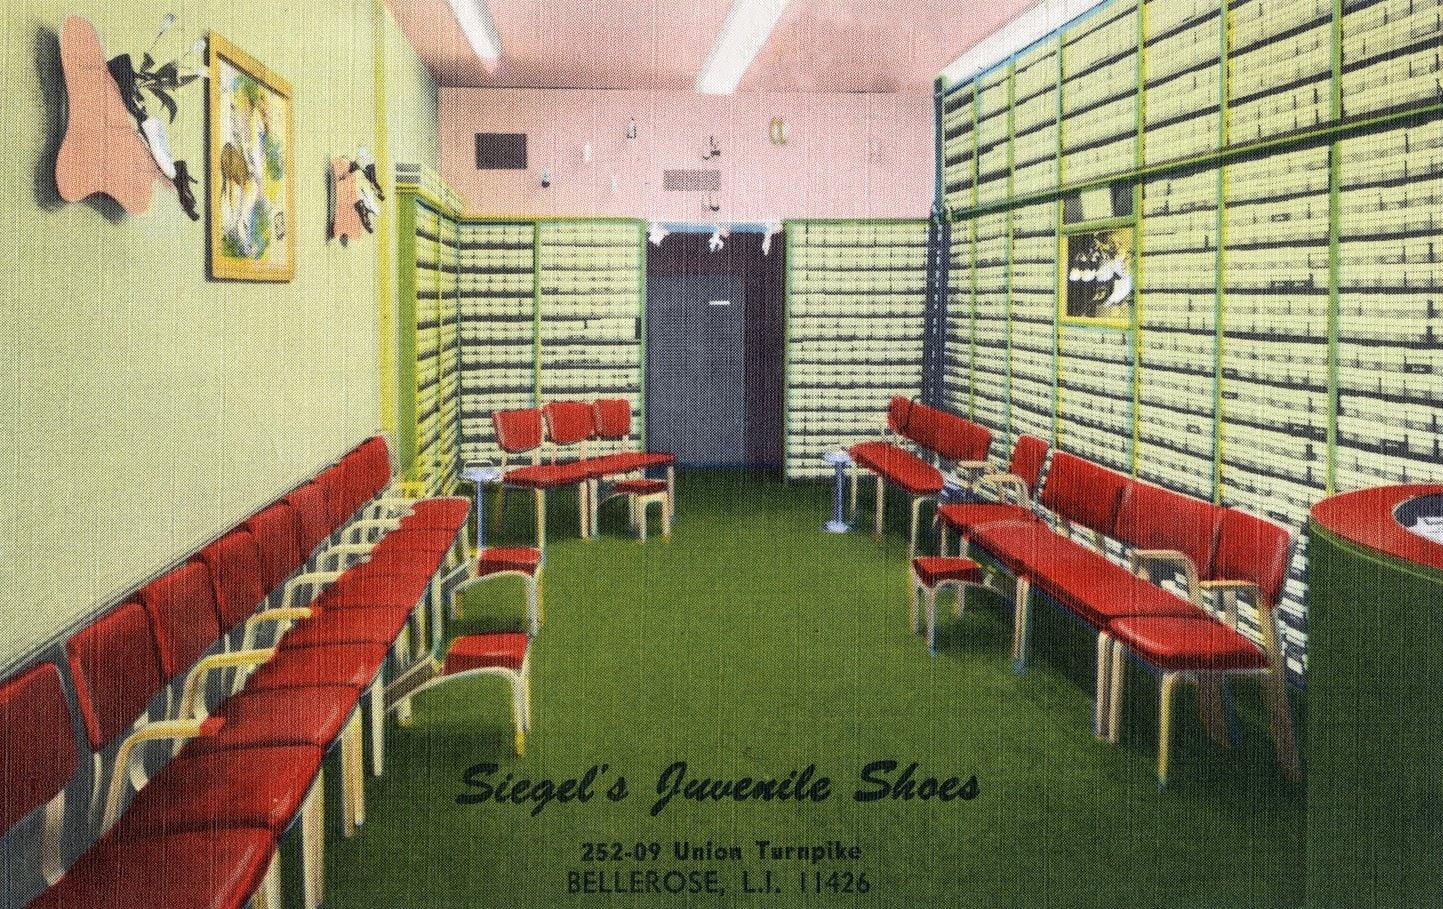 Sigel's Juvenile Shoes - Long Island, New York (1940s)